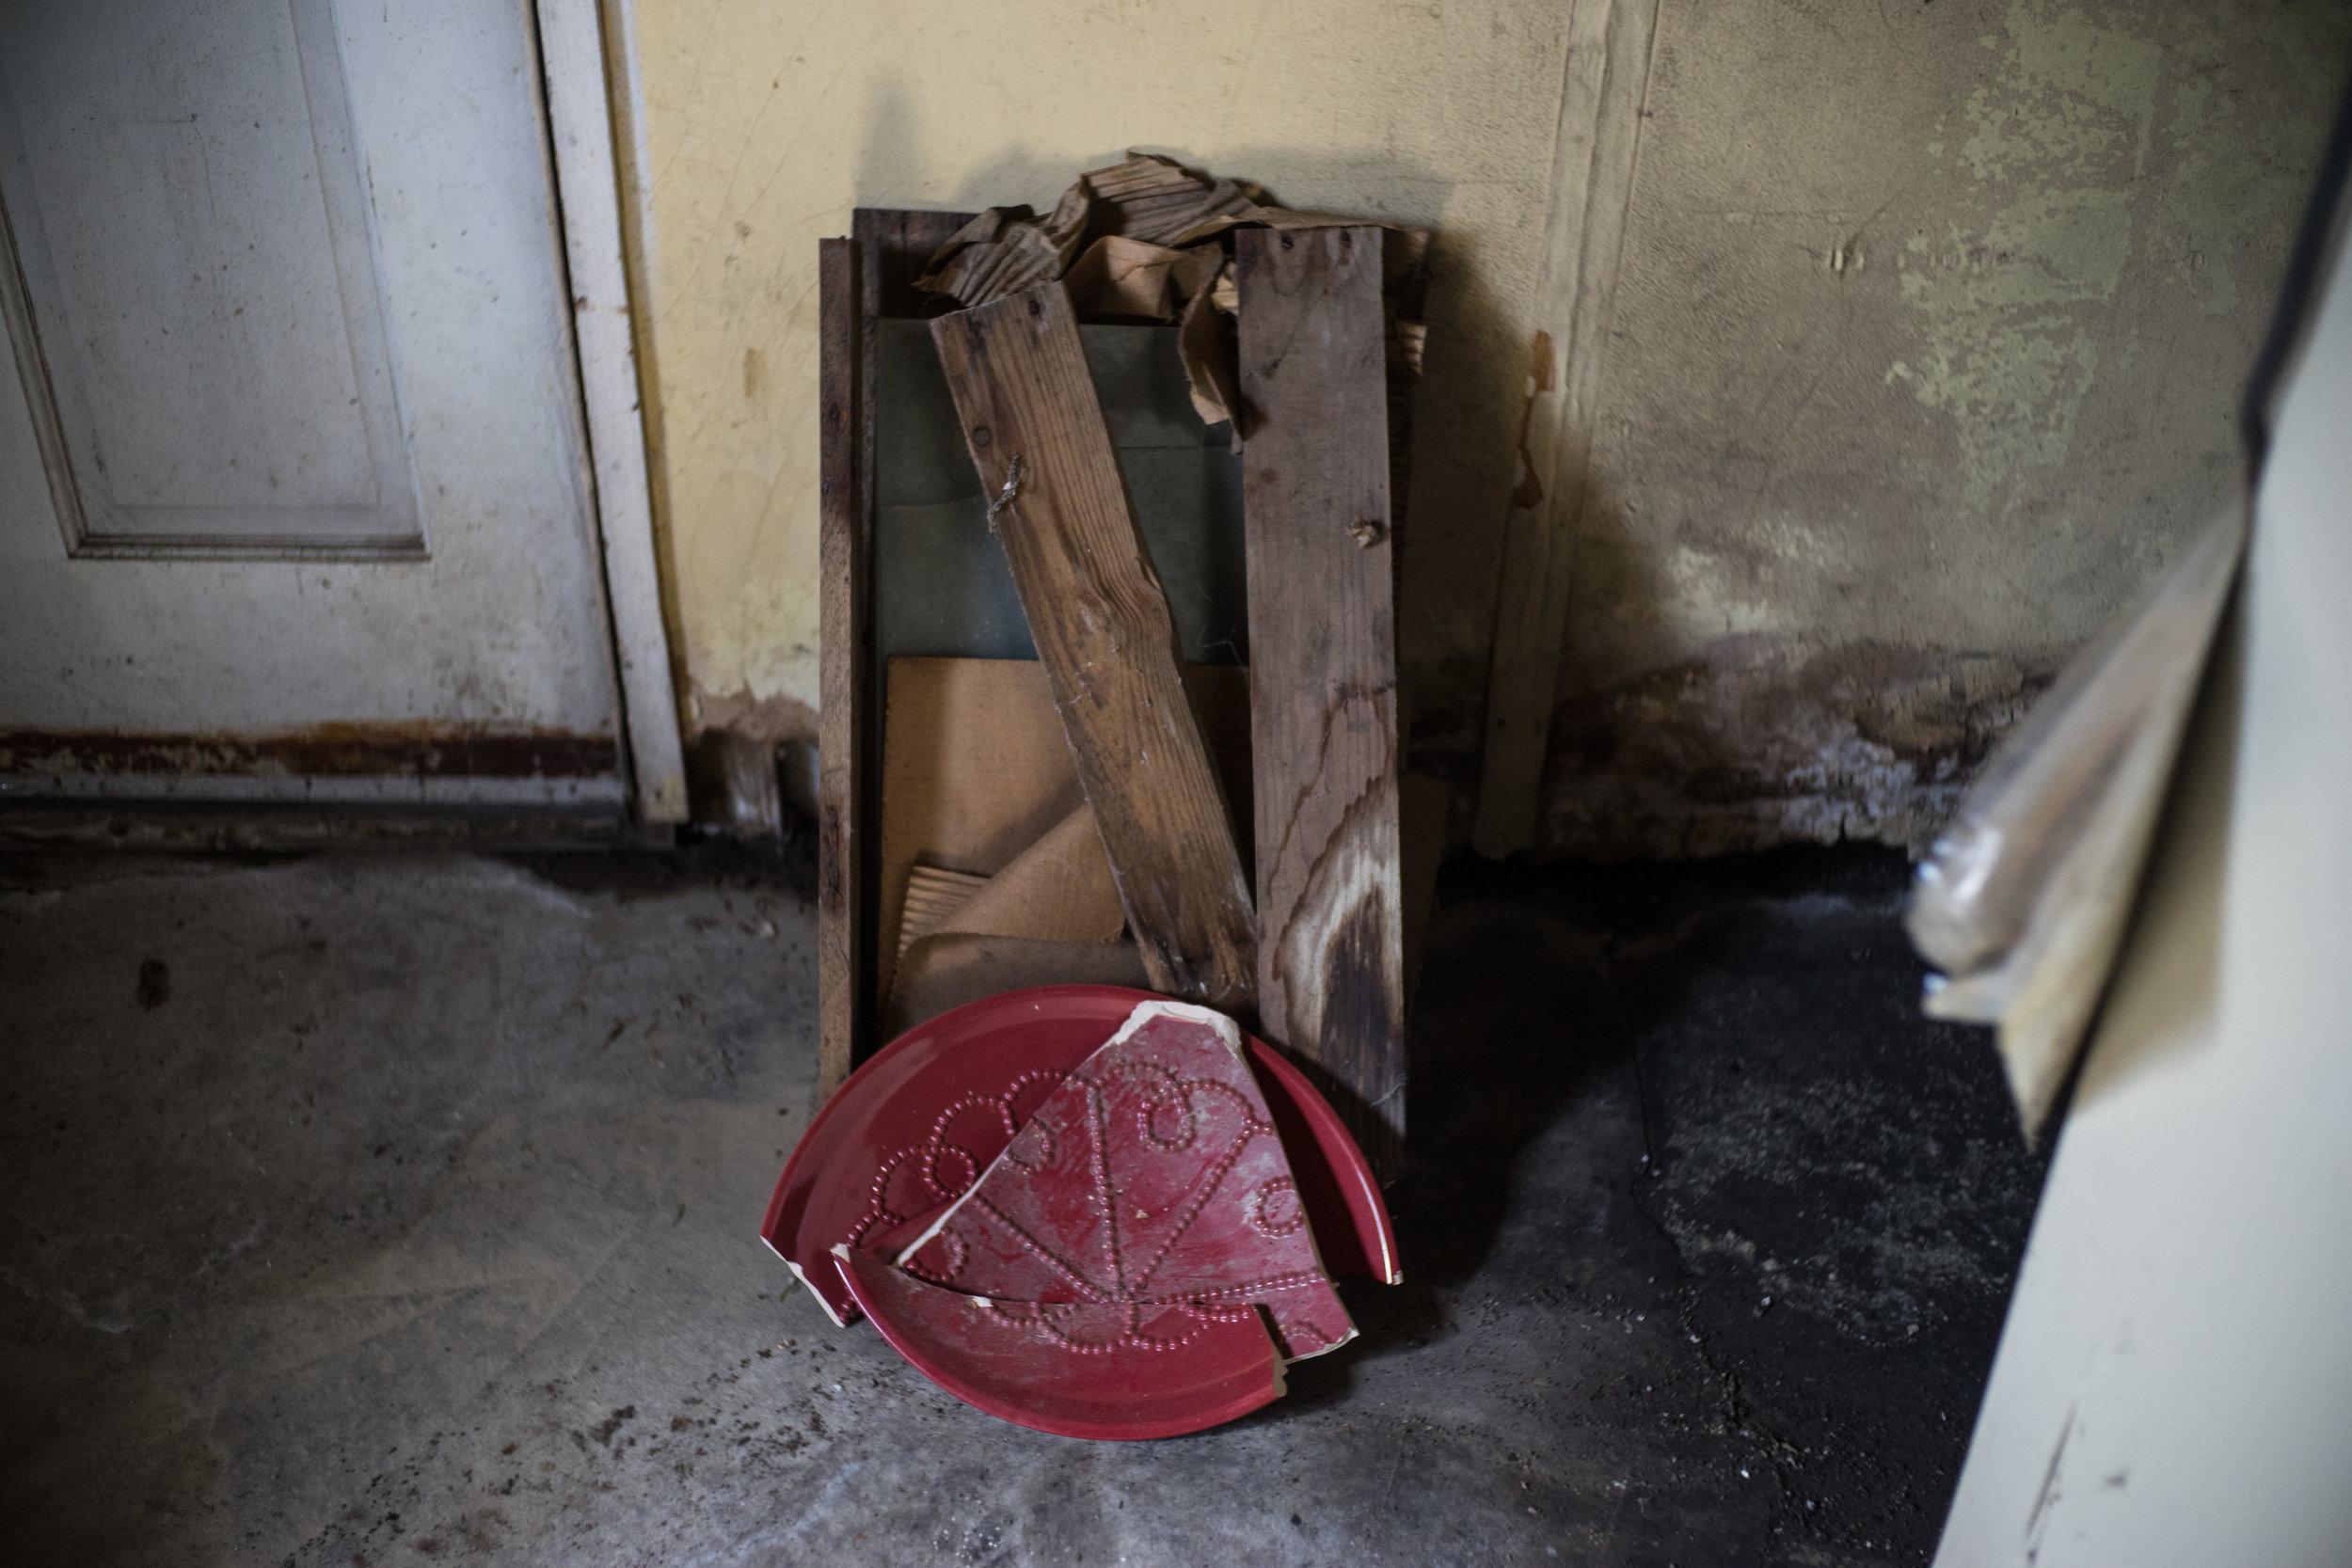 House_After_Death-170-1.jpg